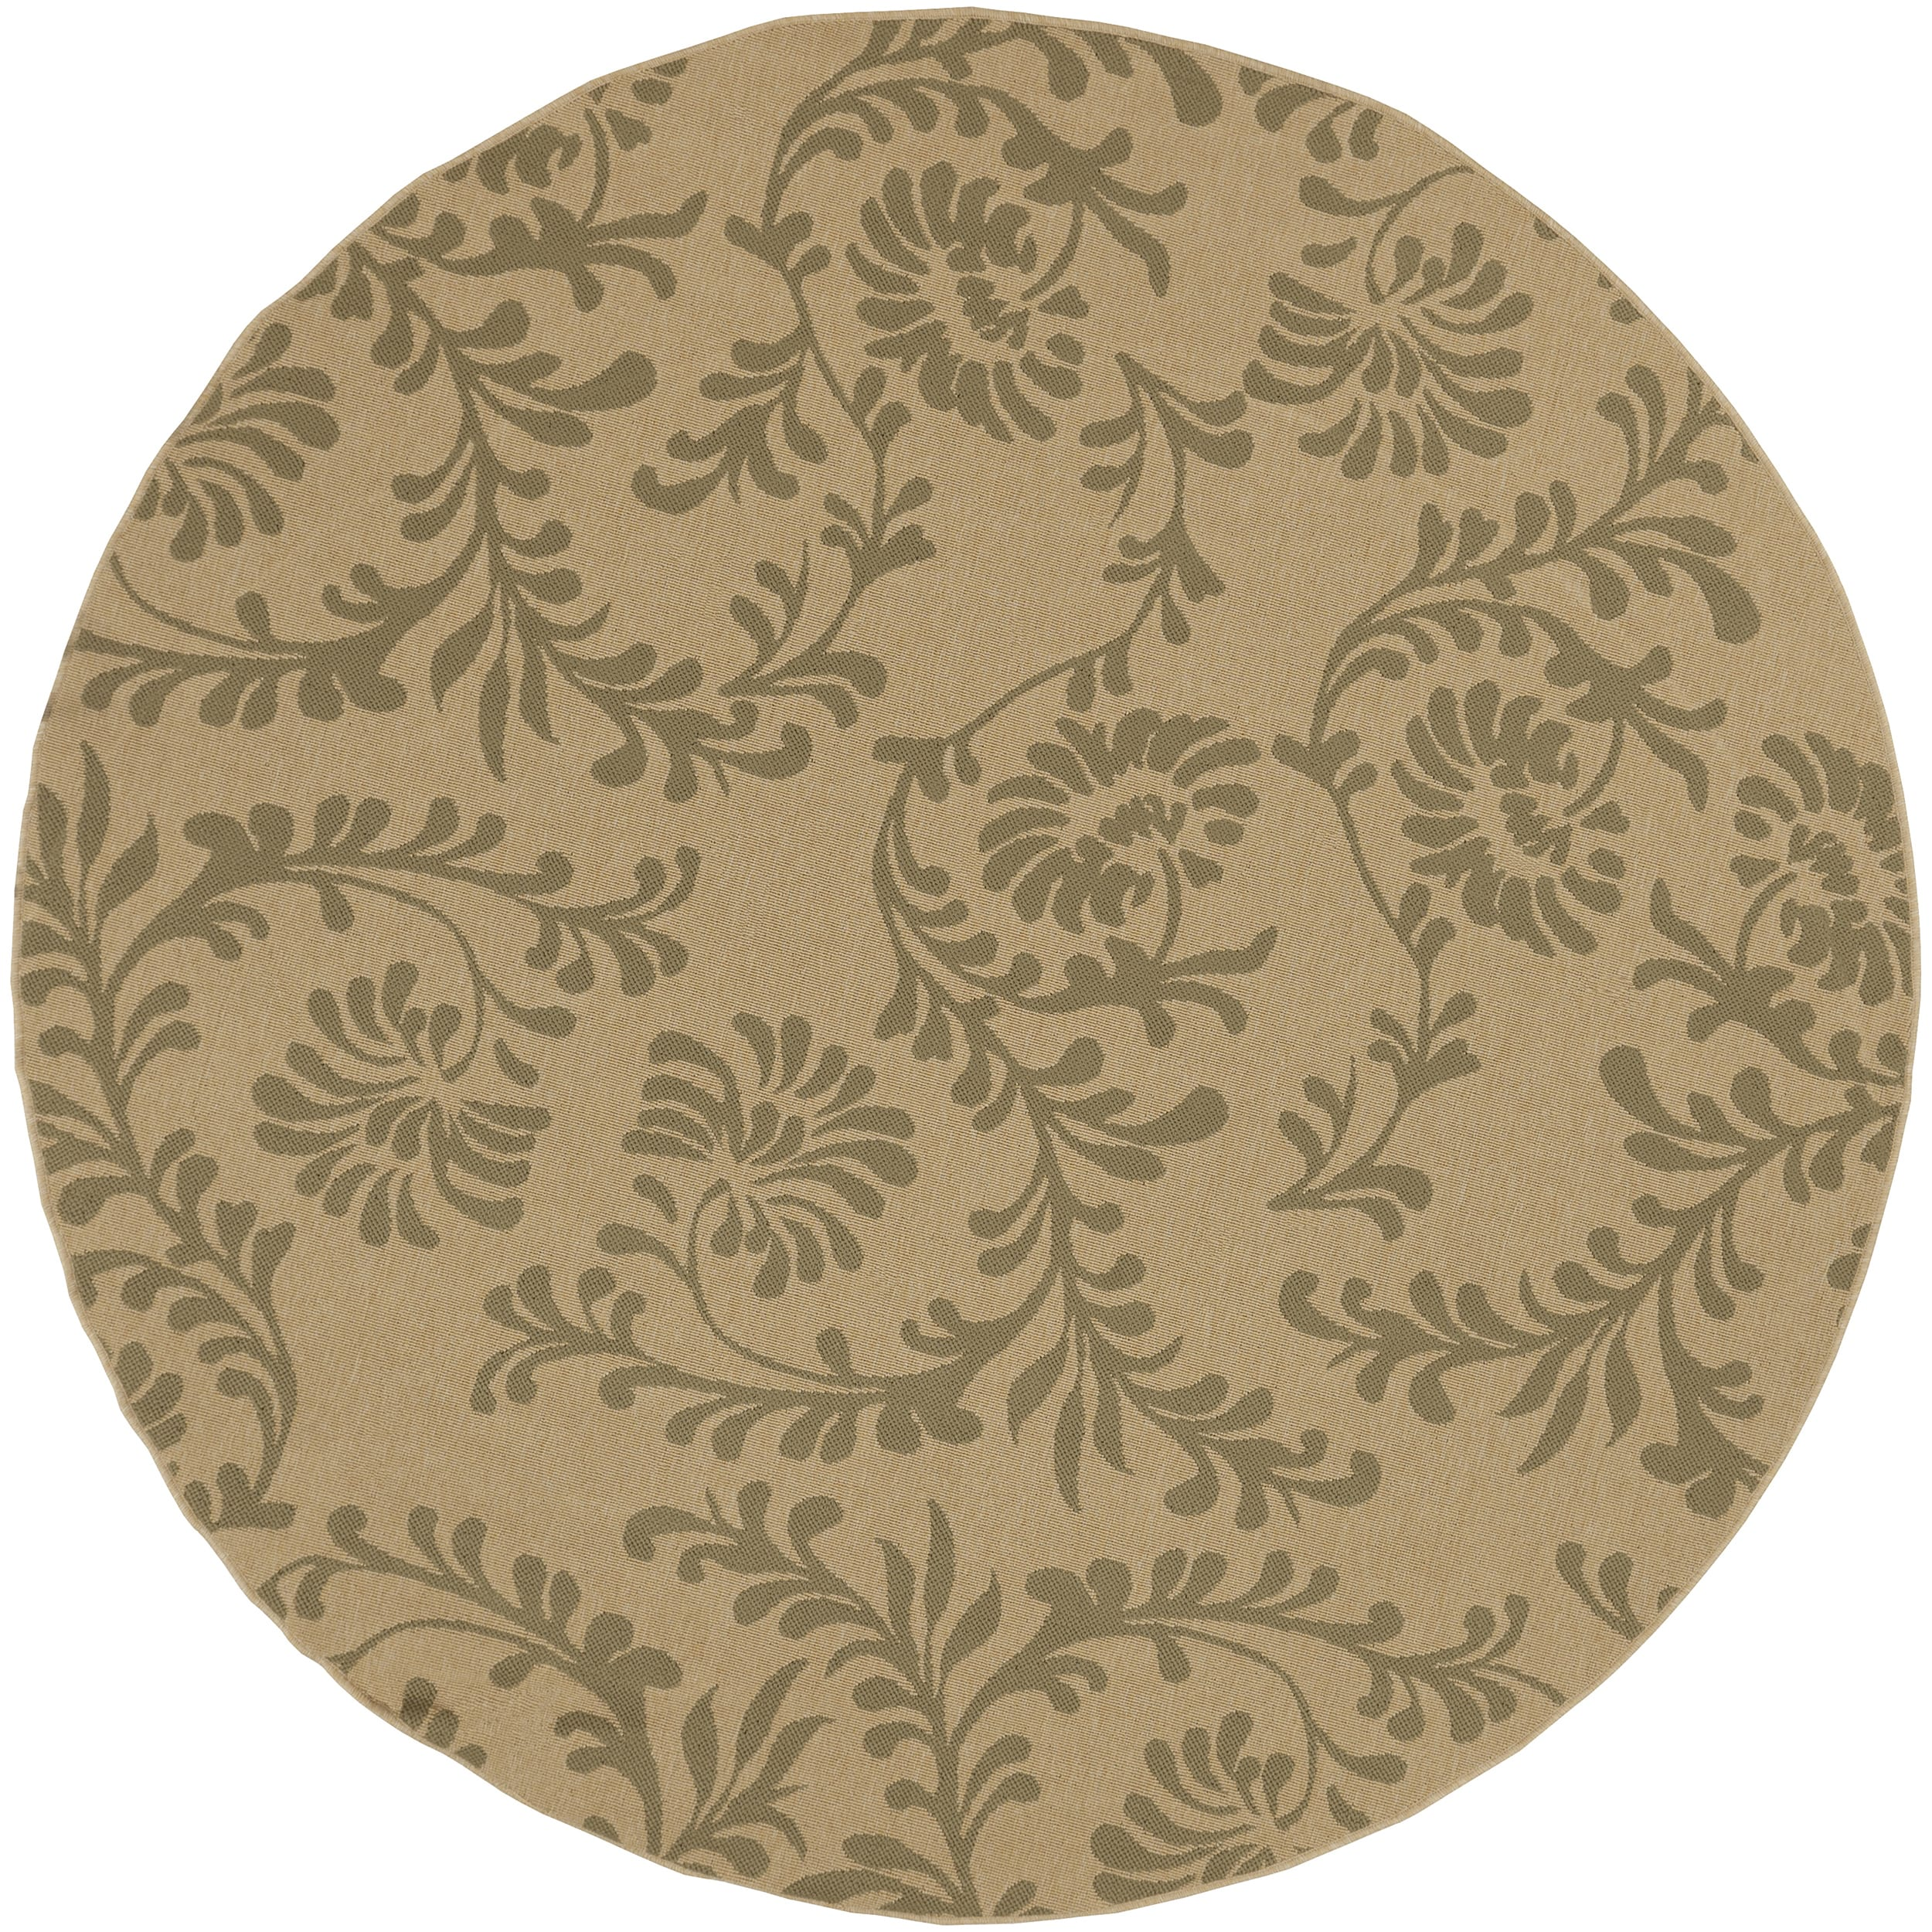 Ardara Khaki Floral Indoor/Outdoor Rug (5'3 x 5'3)